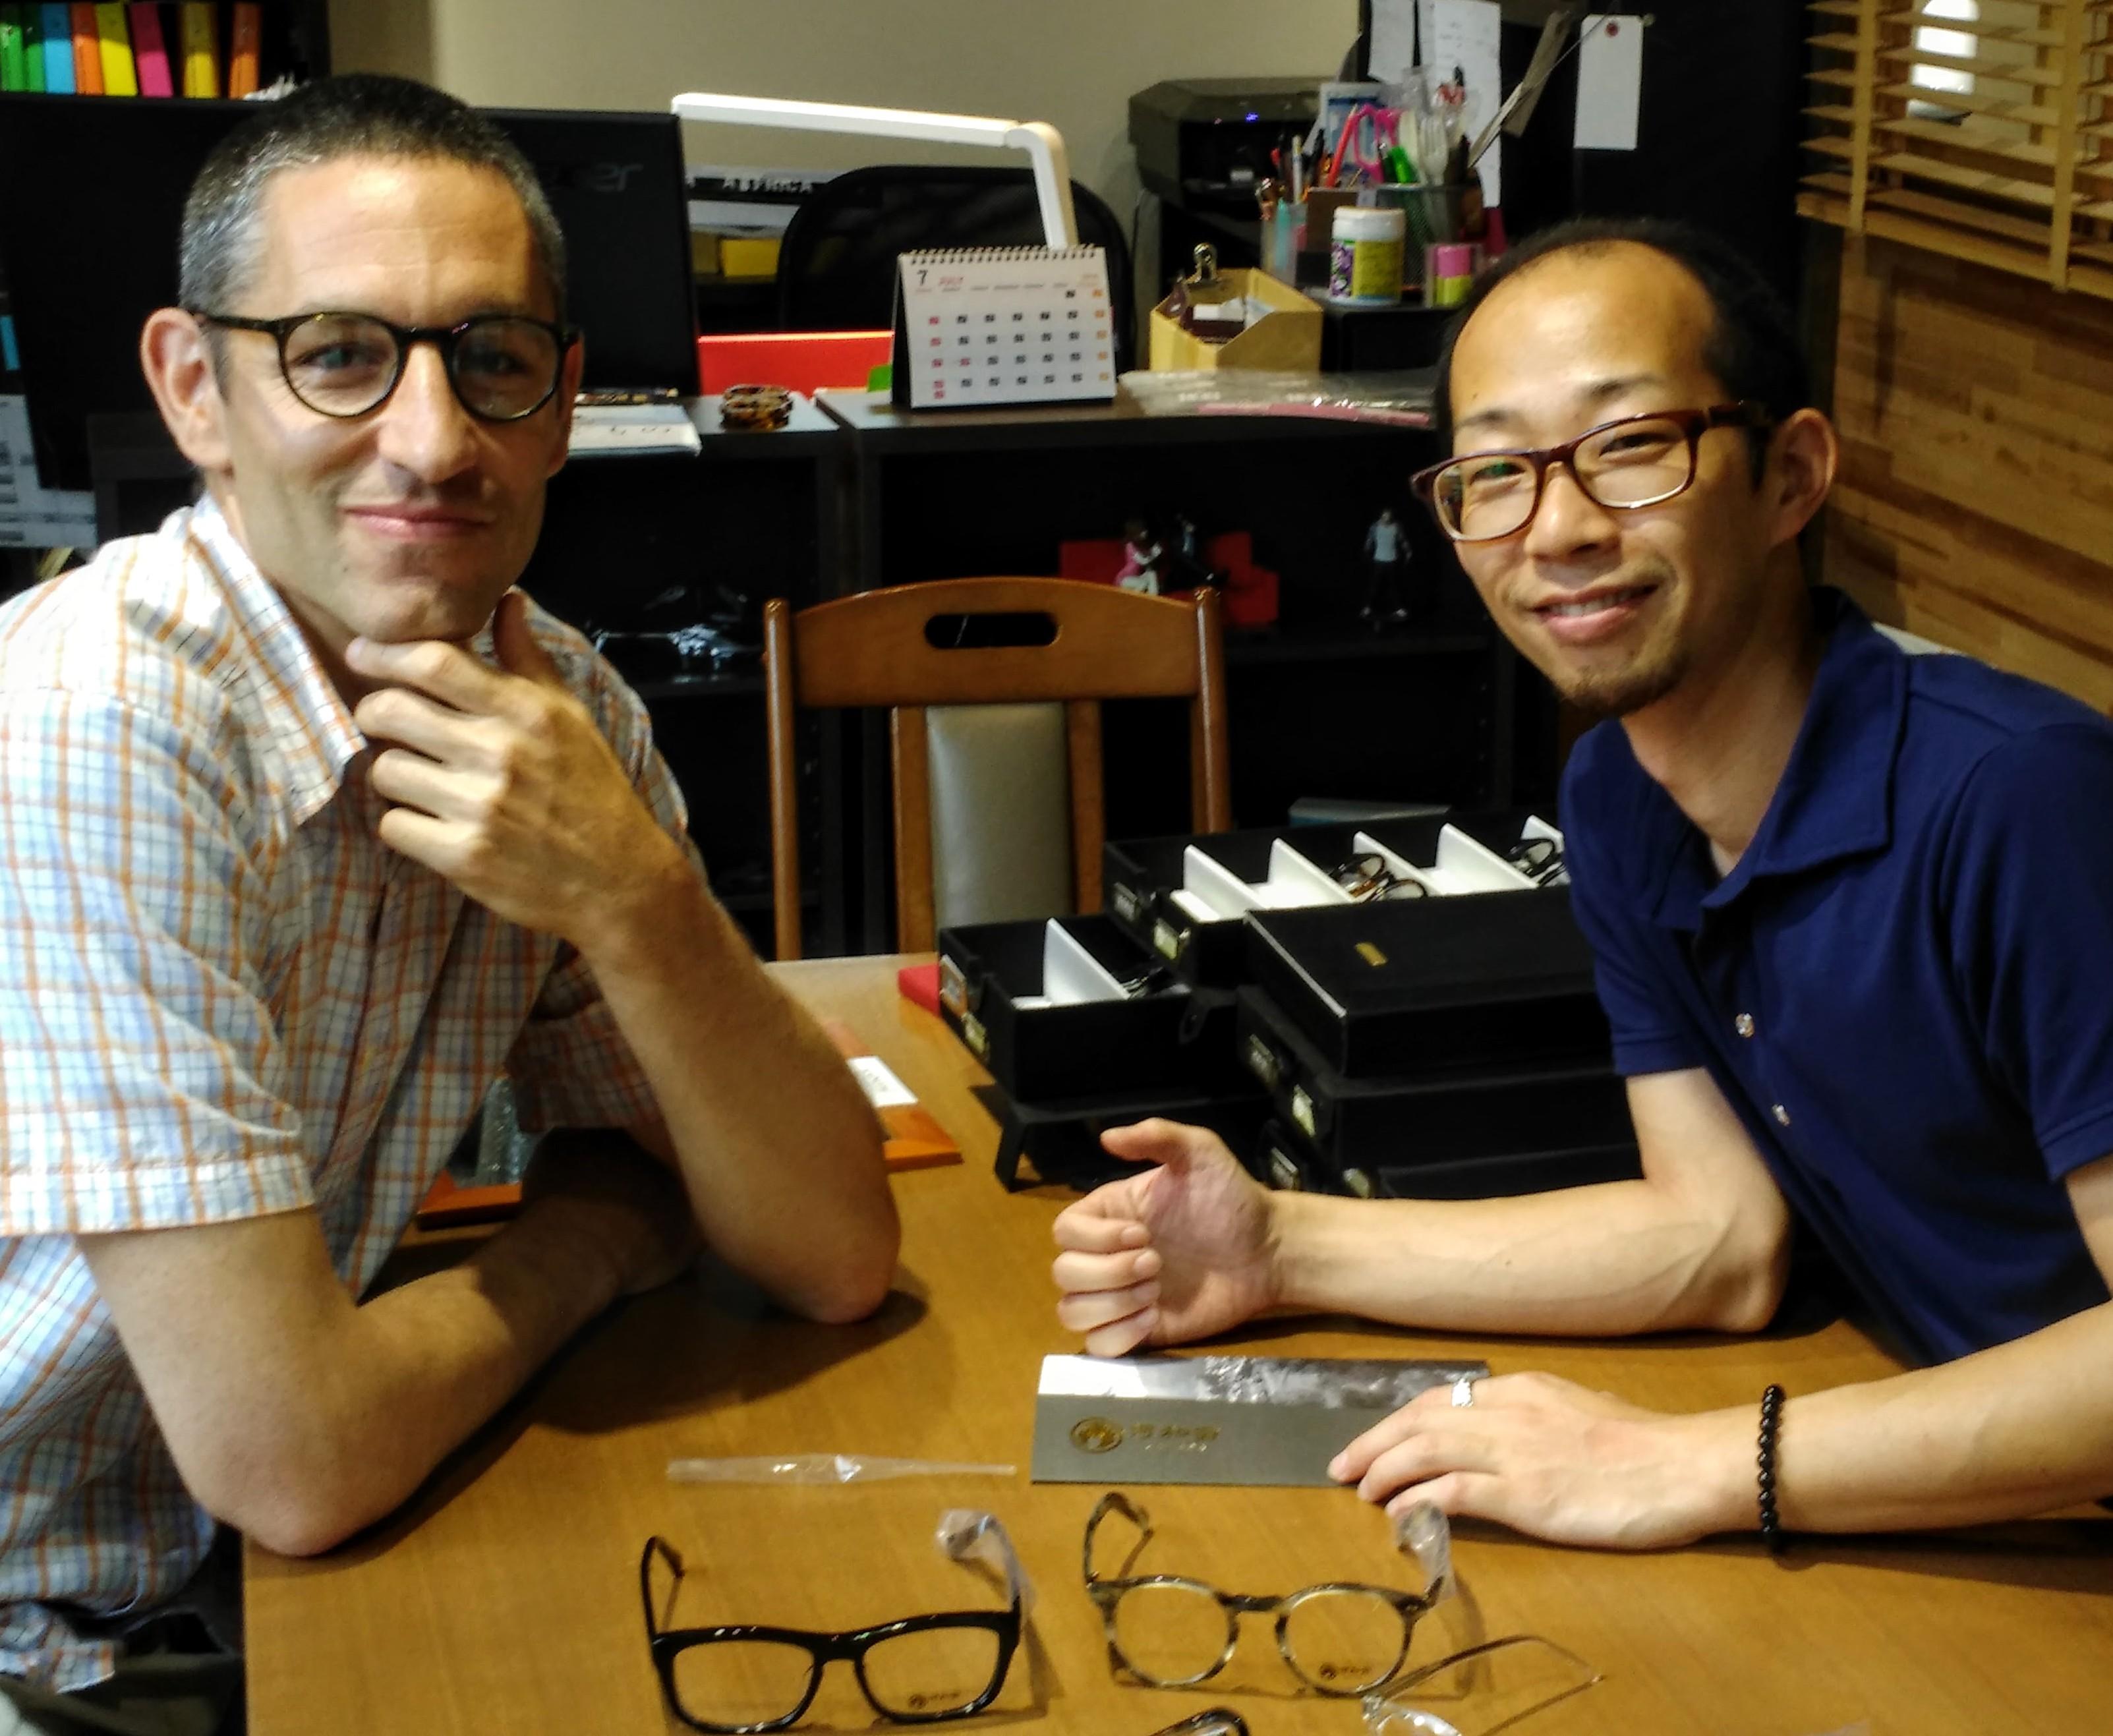 Visiting interesting eyeglasses design house (combination acetate titanium frames)